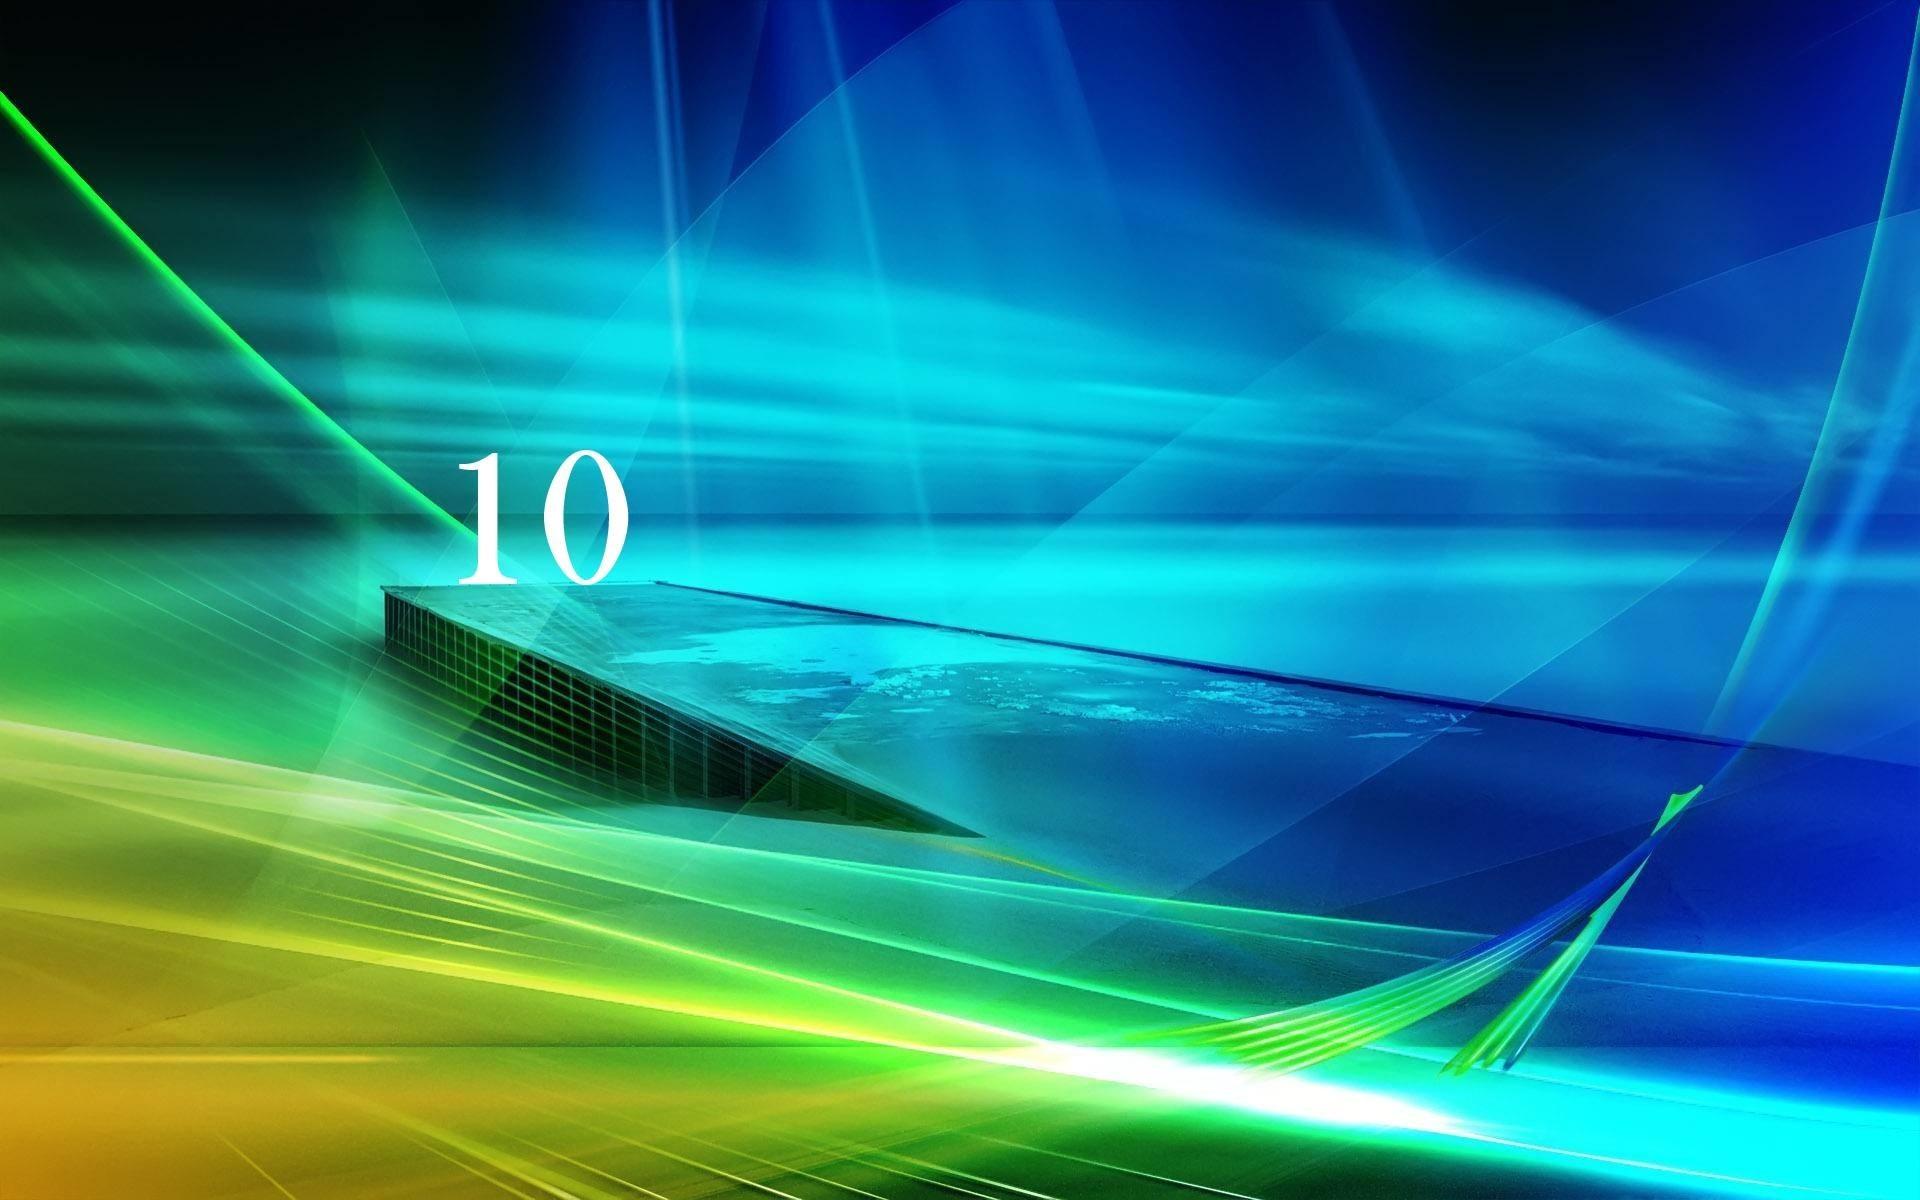 Res: 1920x1200,  Style Server Windows 10 Hd Wallpaper #5886 Wallpaper Themes .